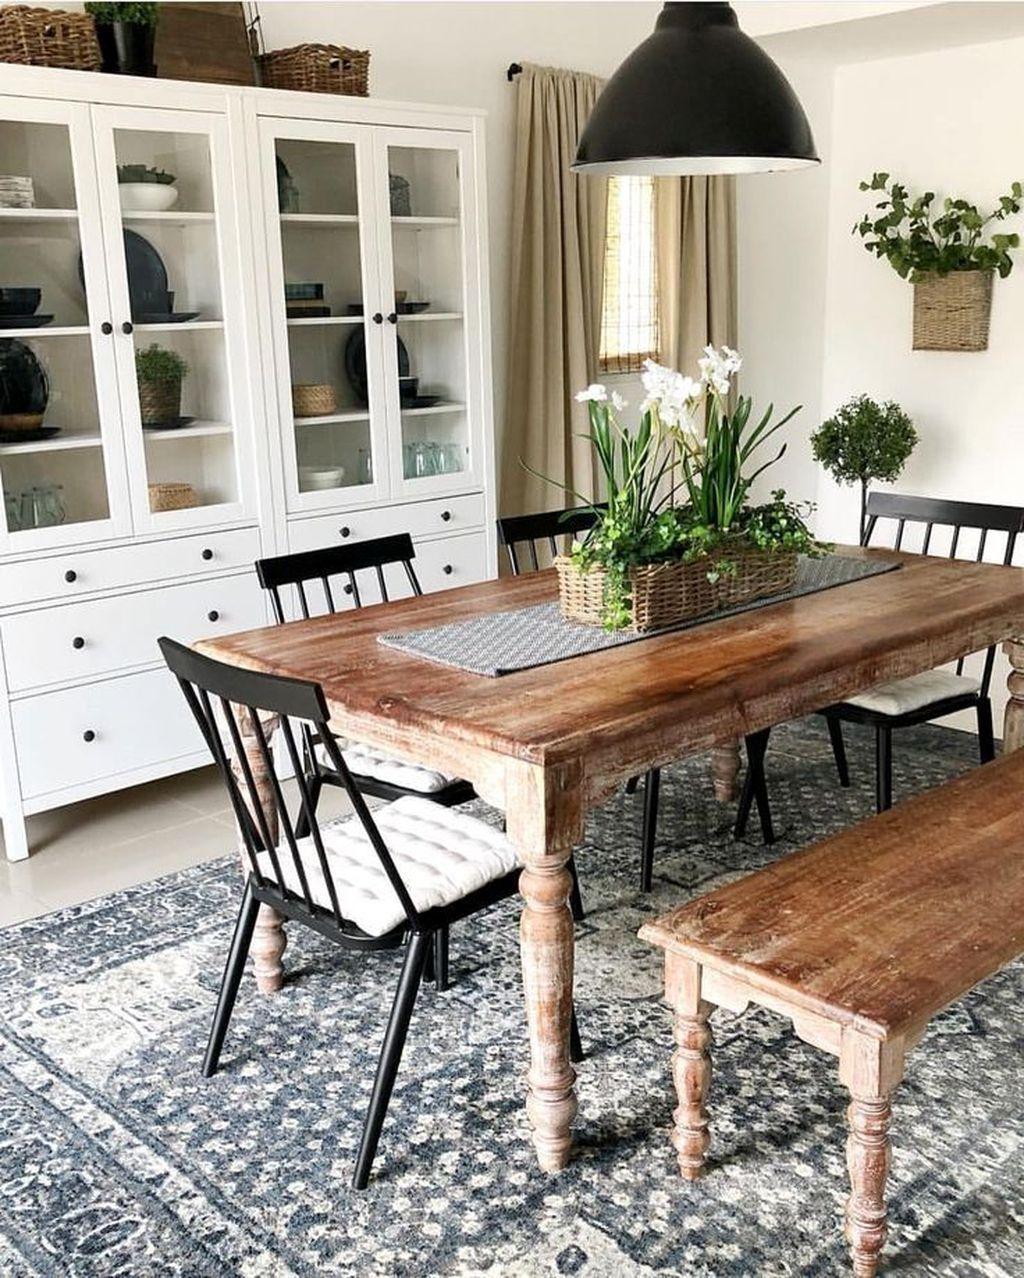 46 Perfect Farmhouse Dining Table Design Ideas Farmhouse Dining